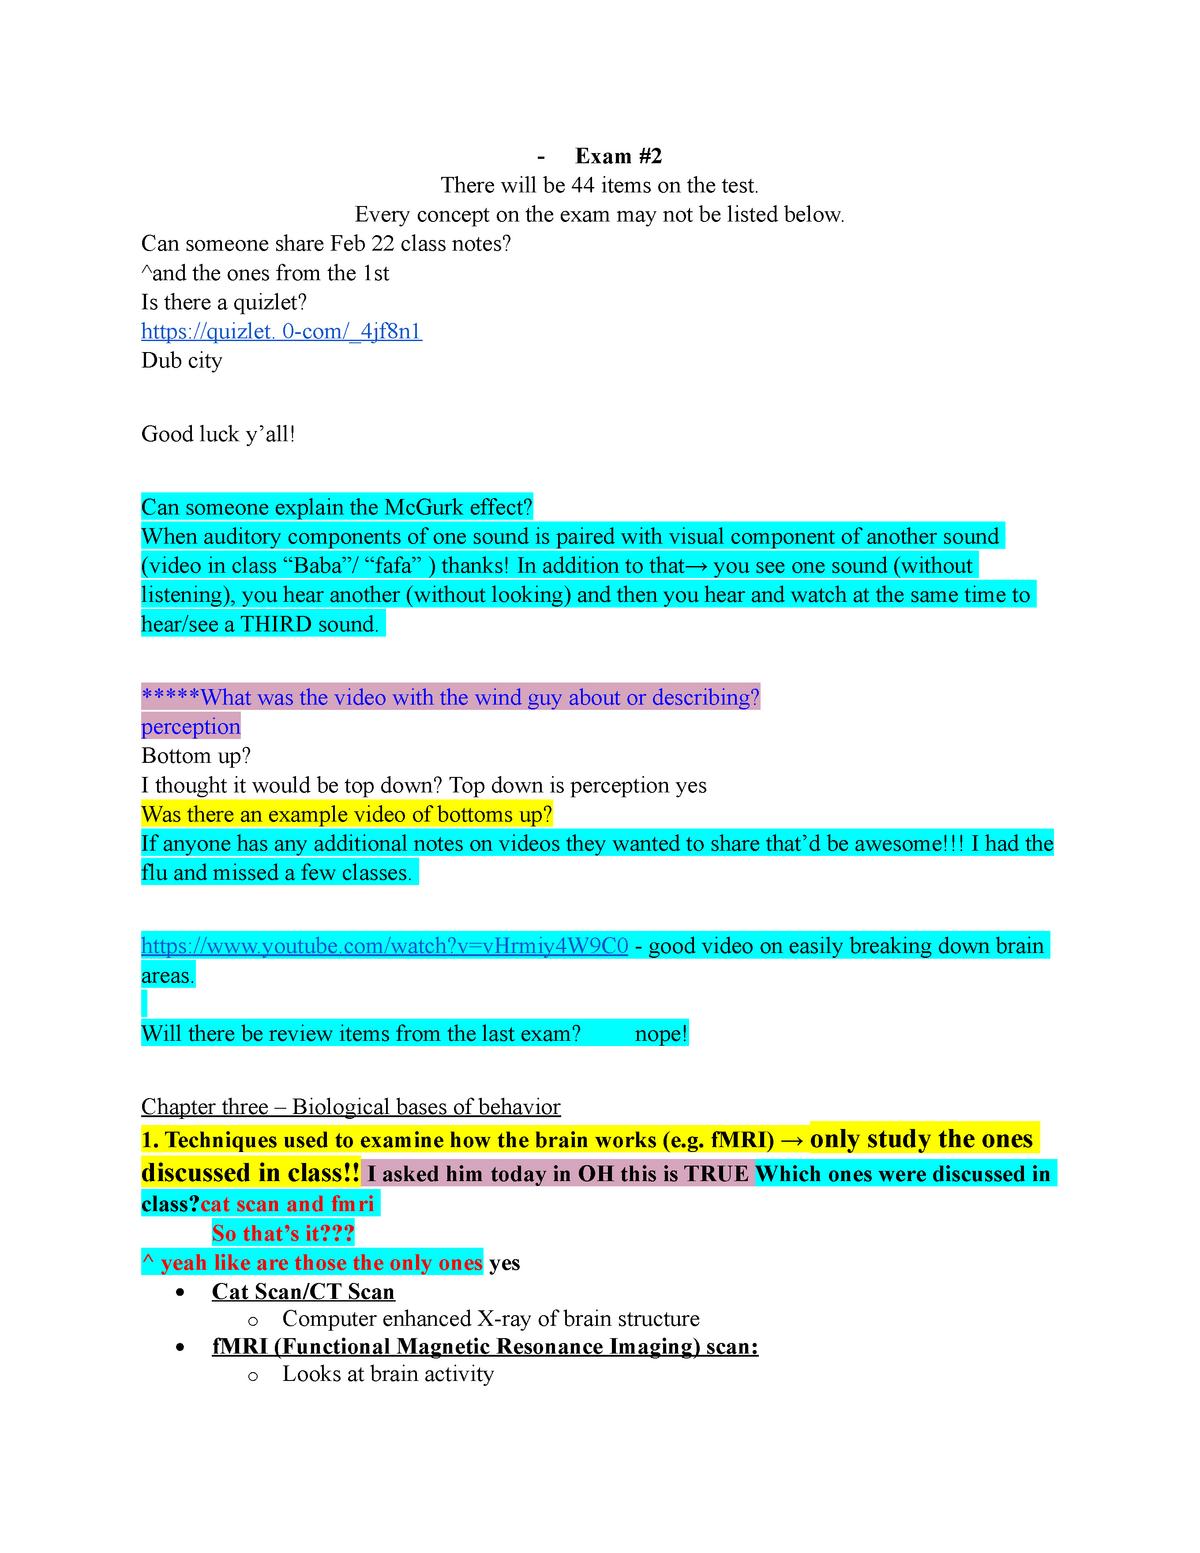 Exam 2 Study Guide Psych 101 - PSYC 101 - UNC Chapel Hill